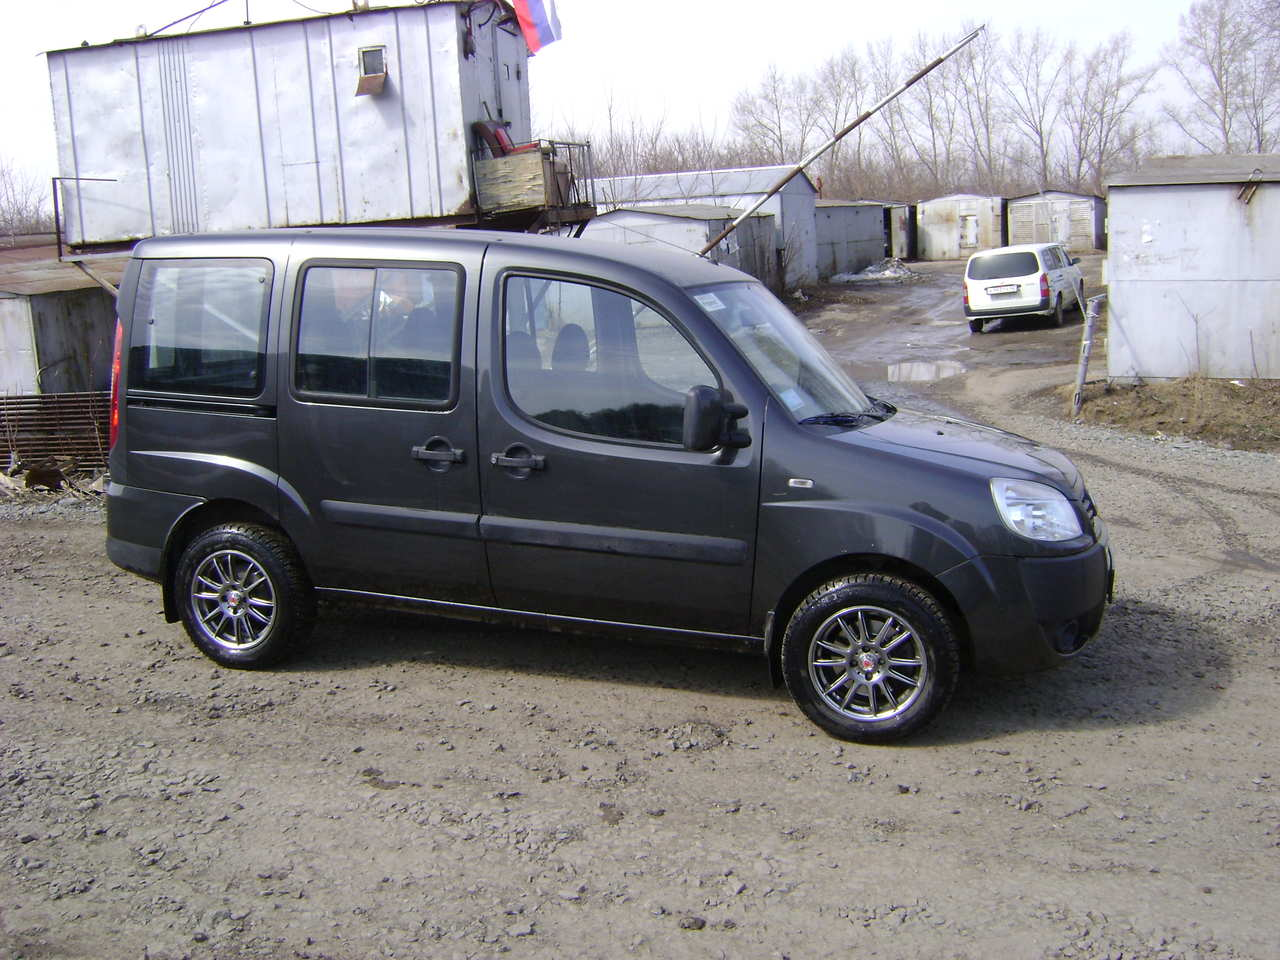 2008 Fiat Doblo Photos 1 4 Gasoline Ff Manual For Sale